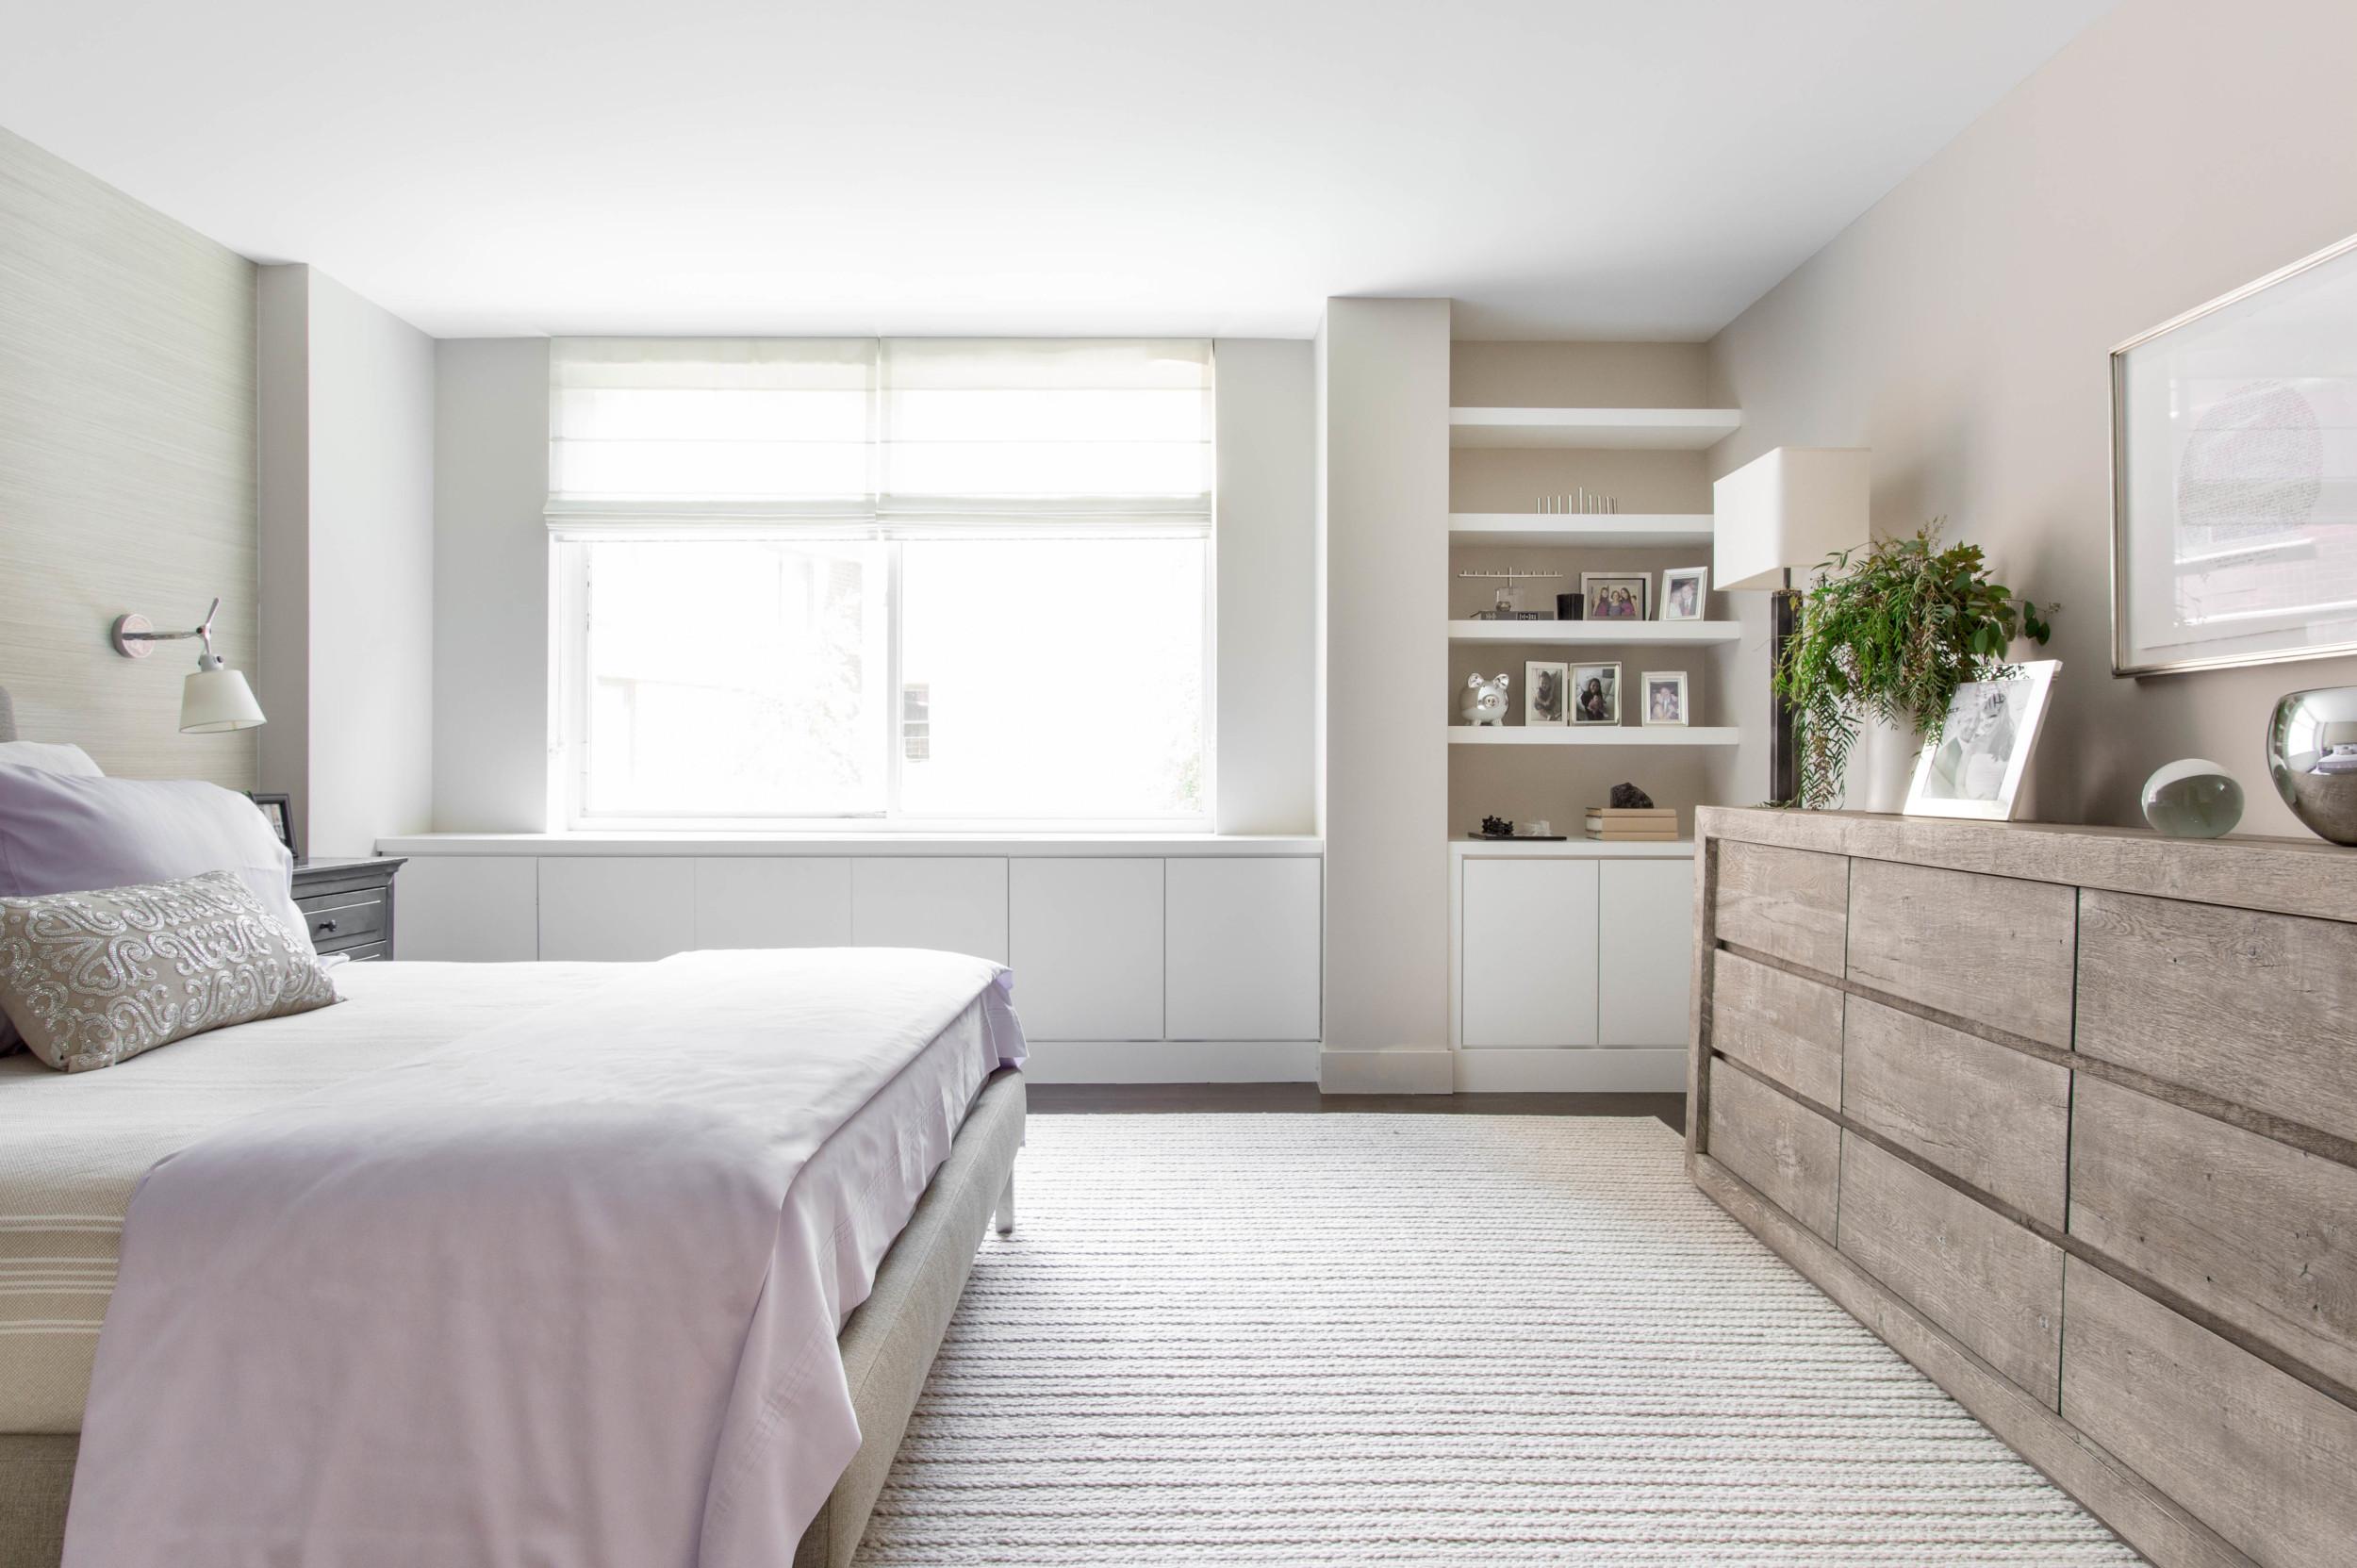 Master Bedroom Design Caroline Kopp CT Connecticut Interior Designers.jpg